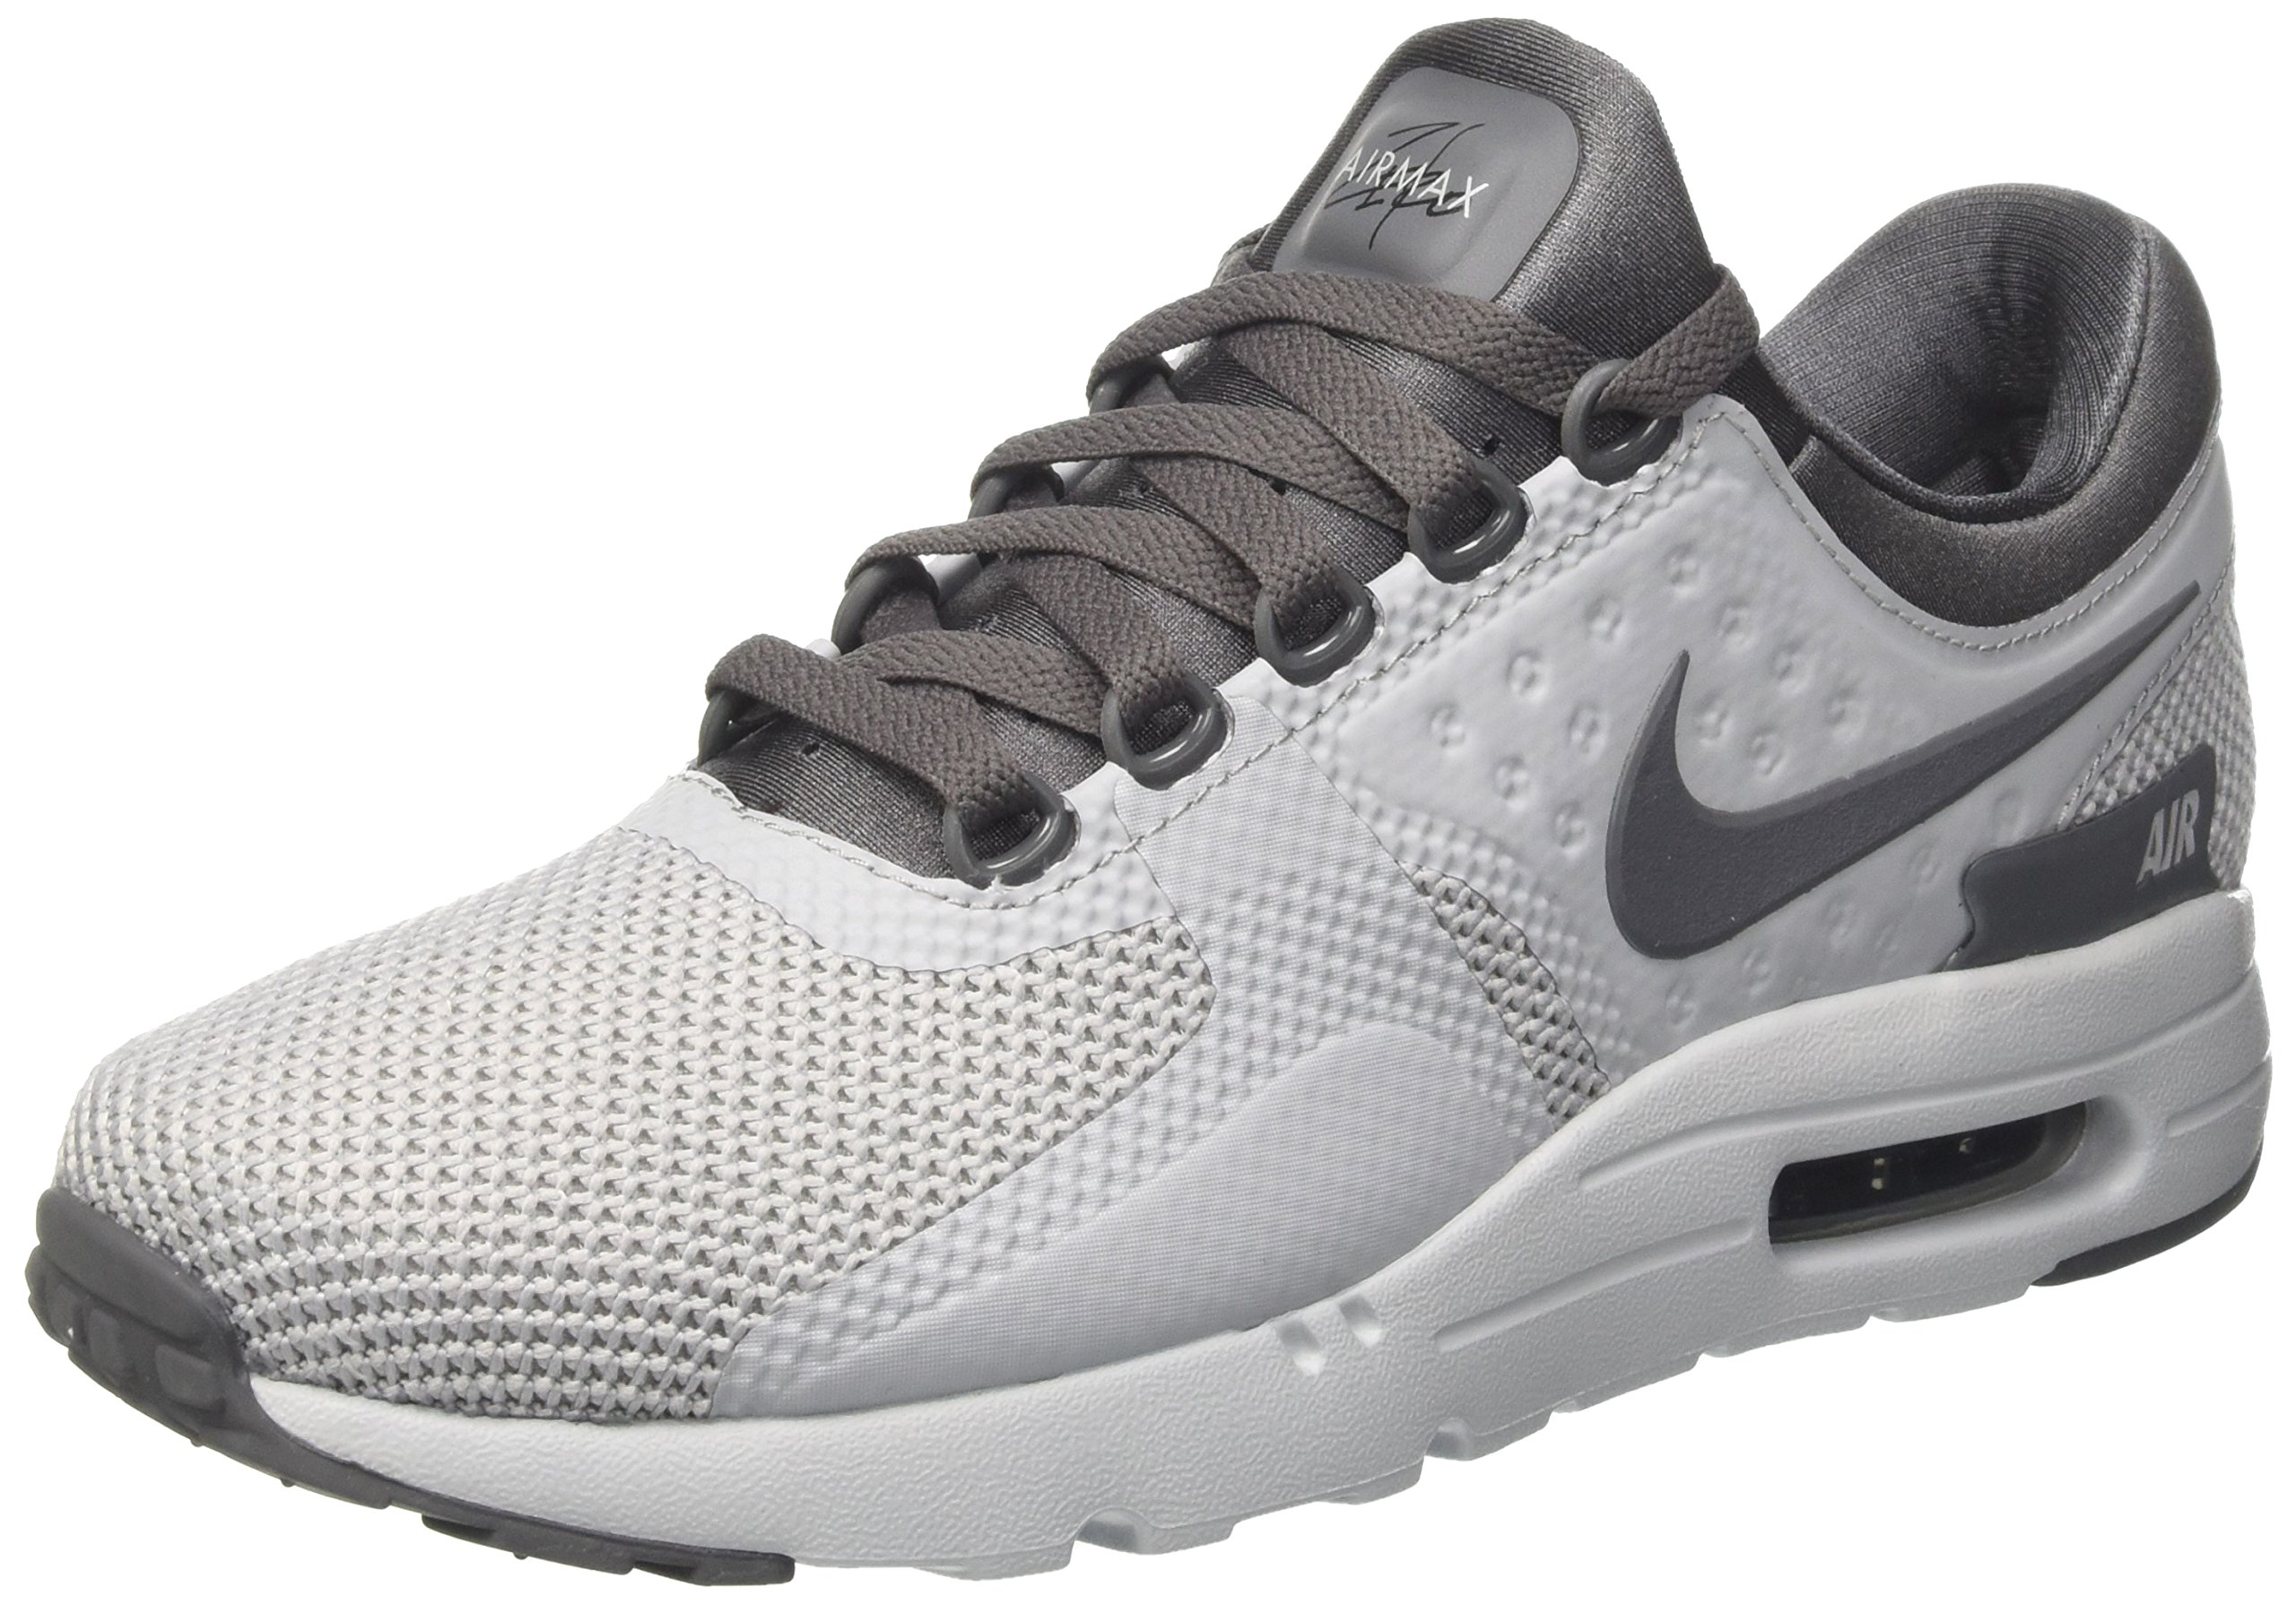 Nike Air Max Zero Essential Mens BlackDark GreyWhite Shoes UK